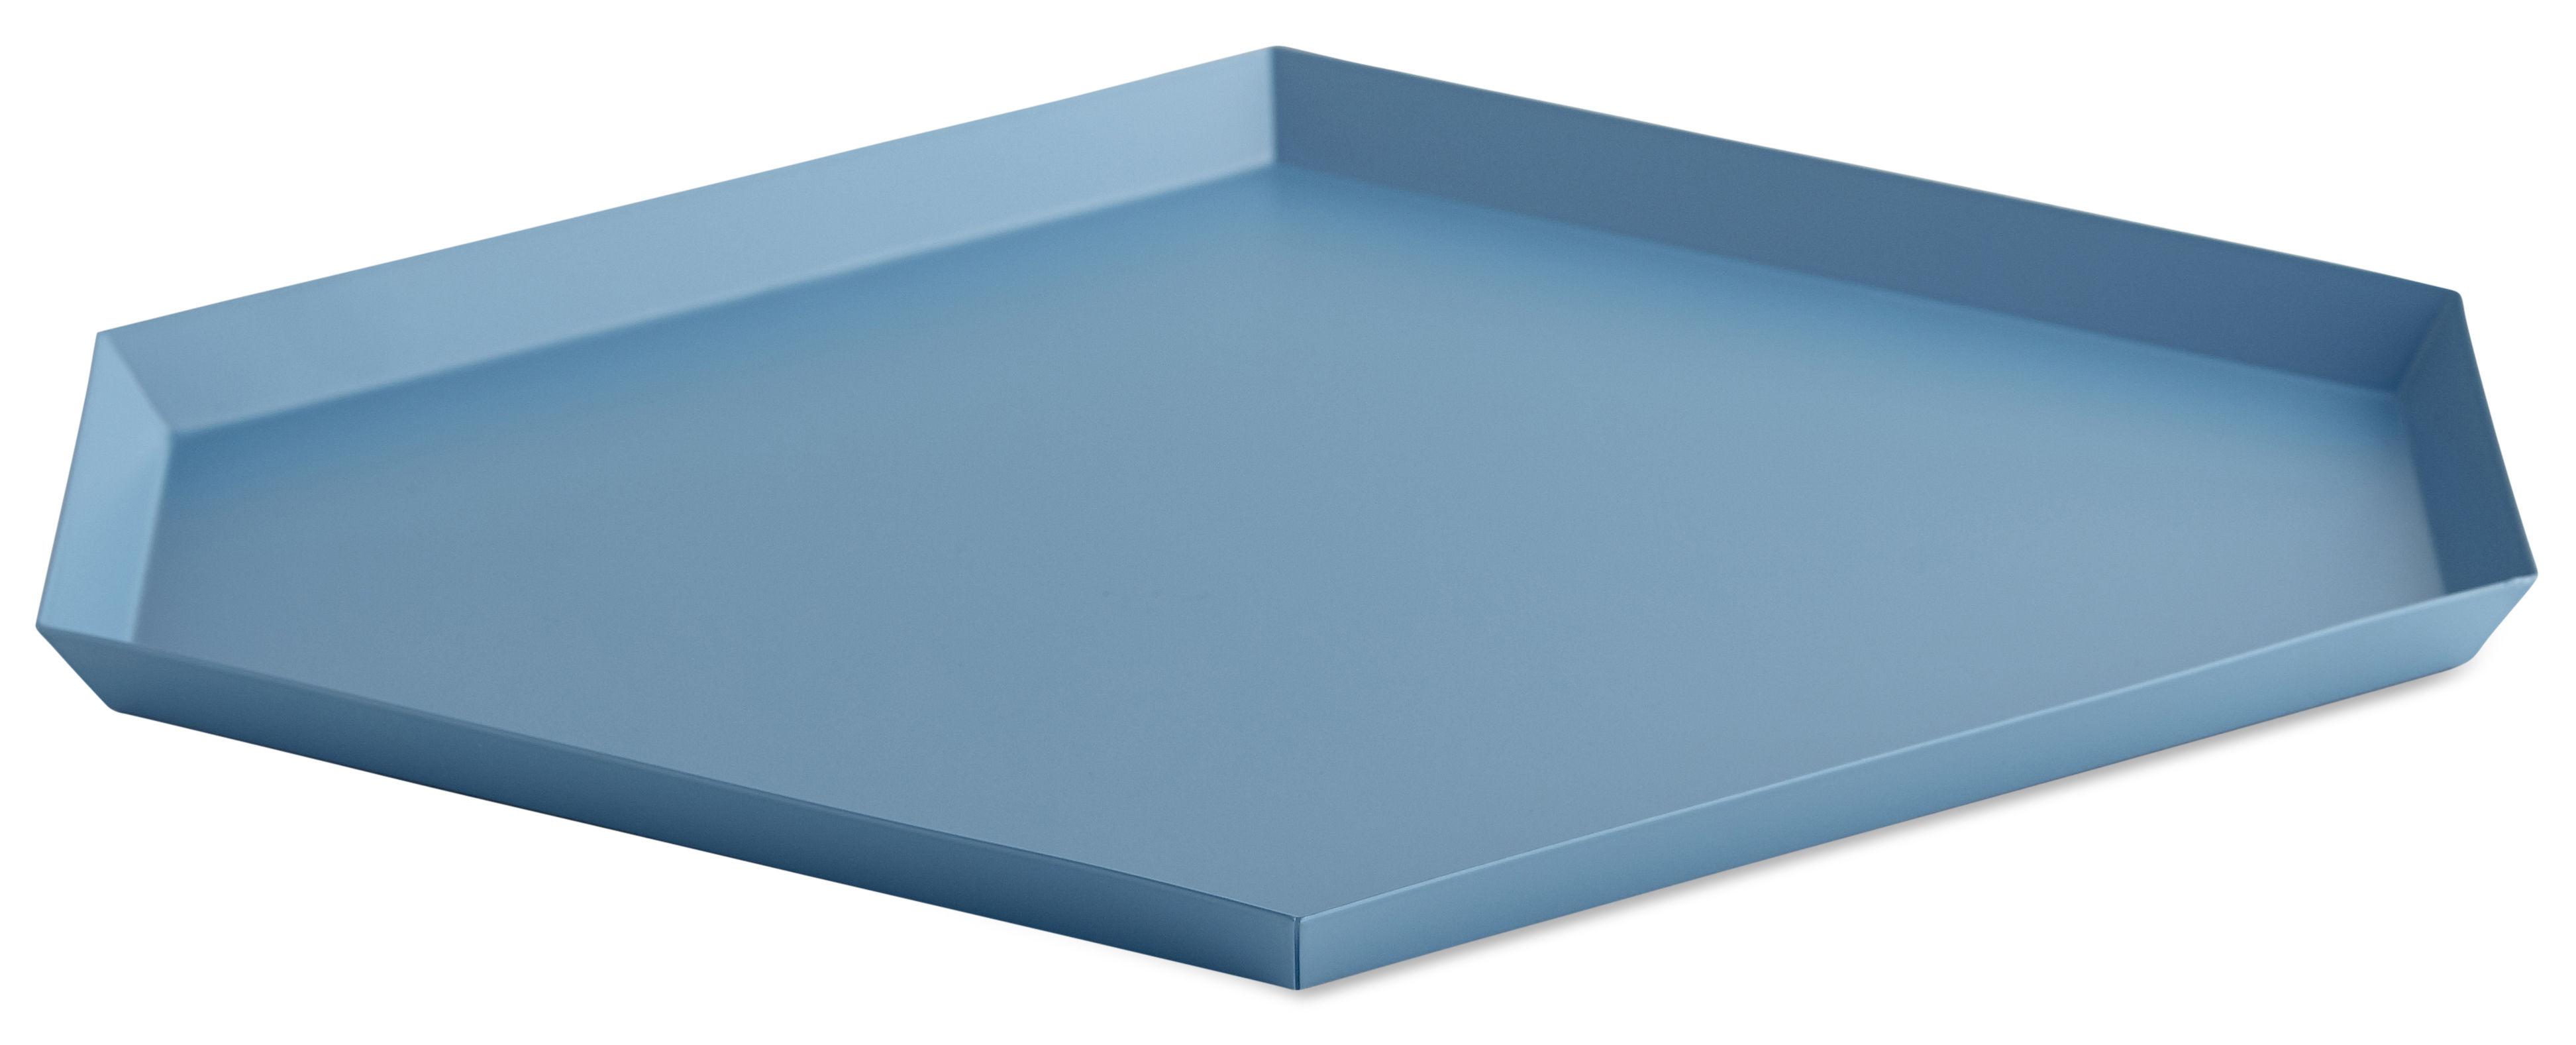 Tavola - Vassoi  - Piano/vassoio Kaleido Large - / 39 x 34 cm di Hay - Blu - Acciaio verniciato